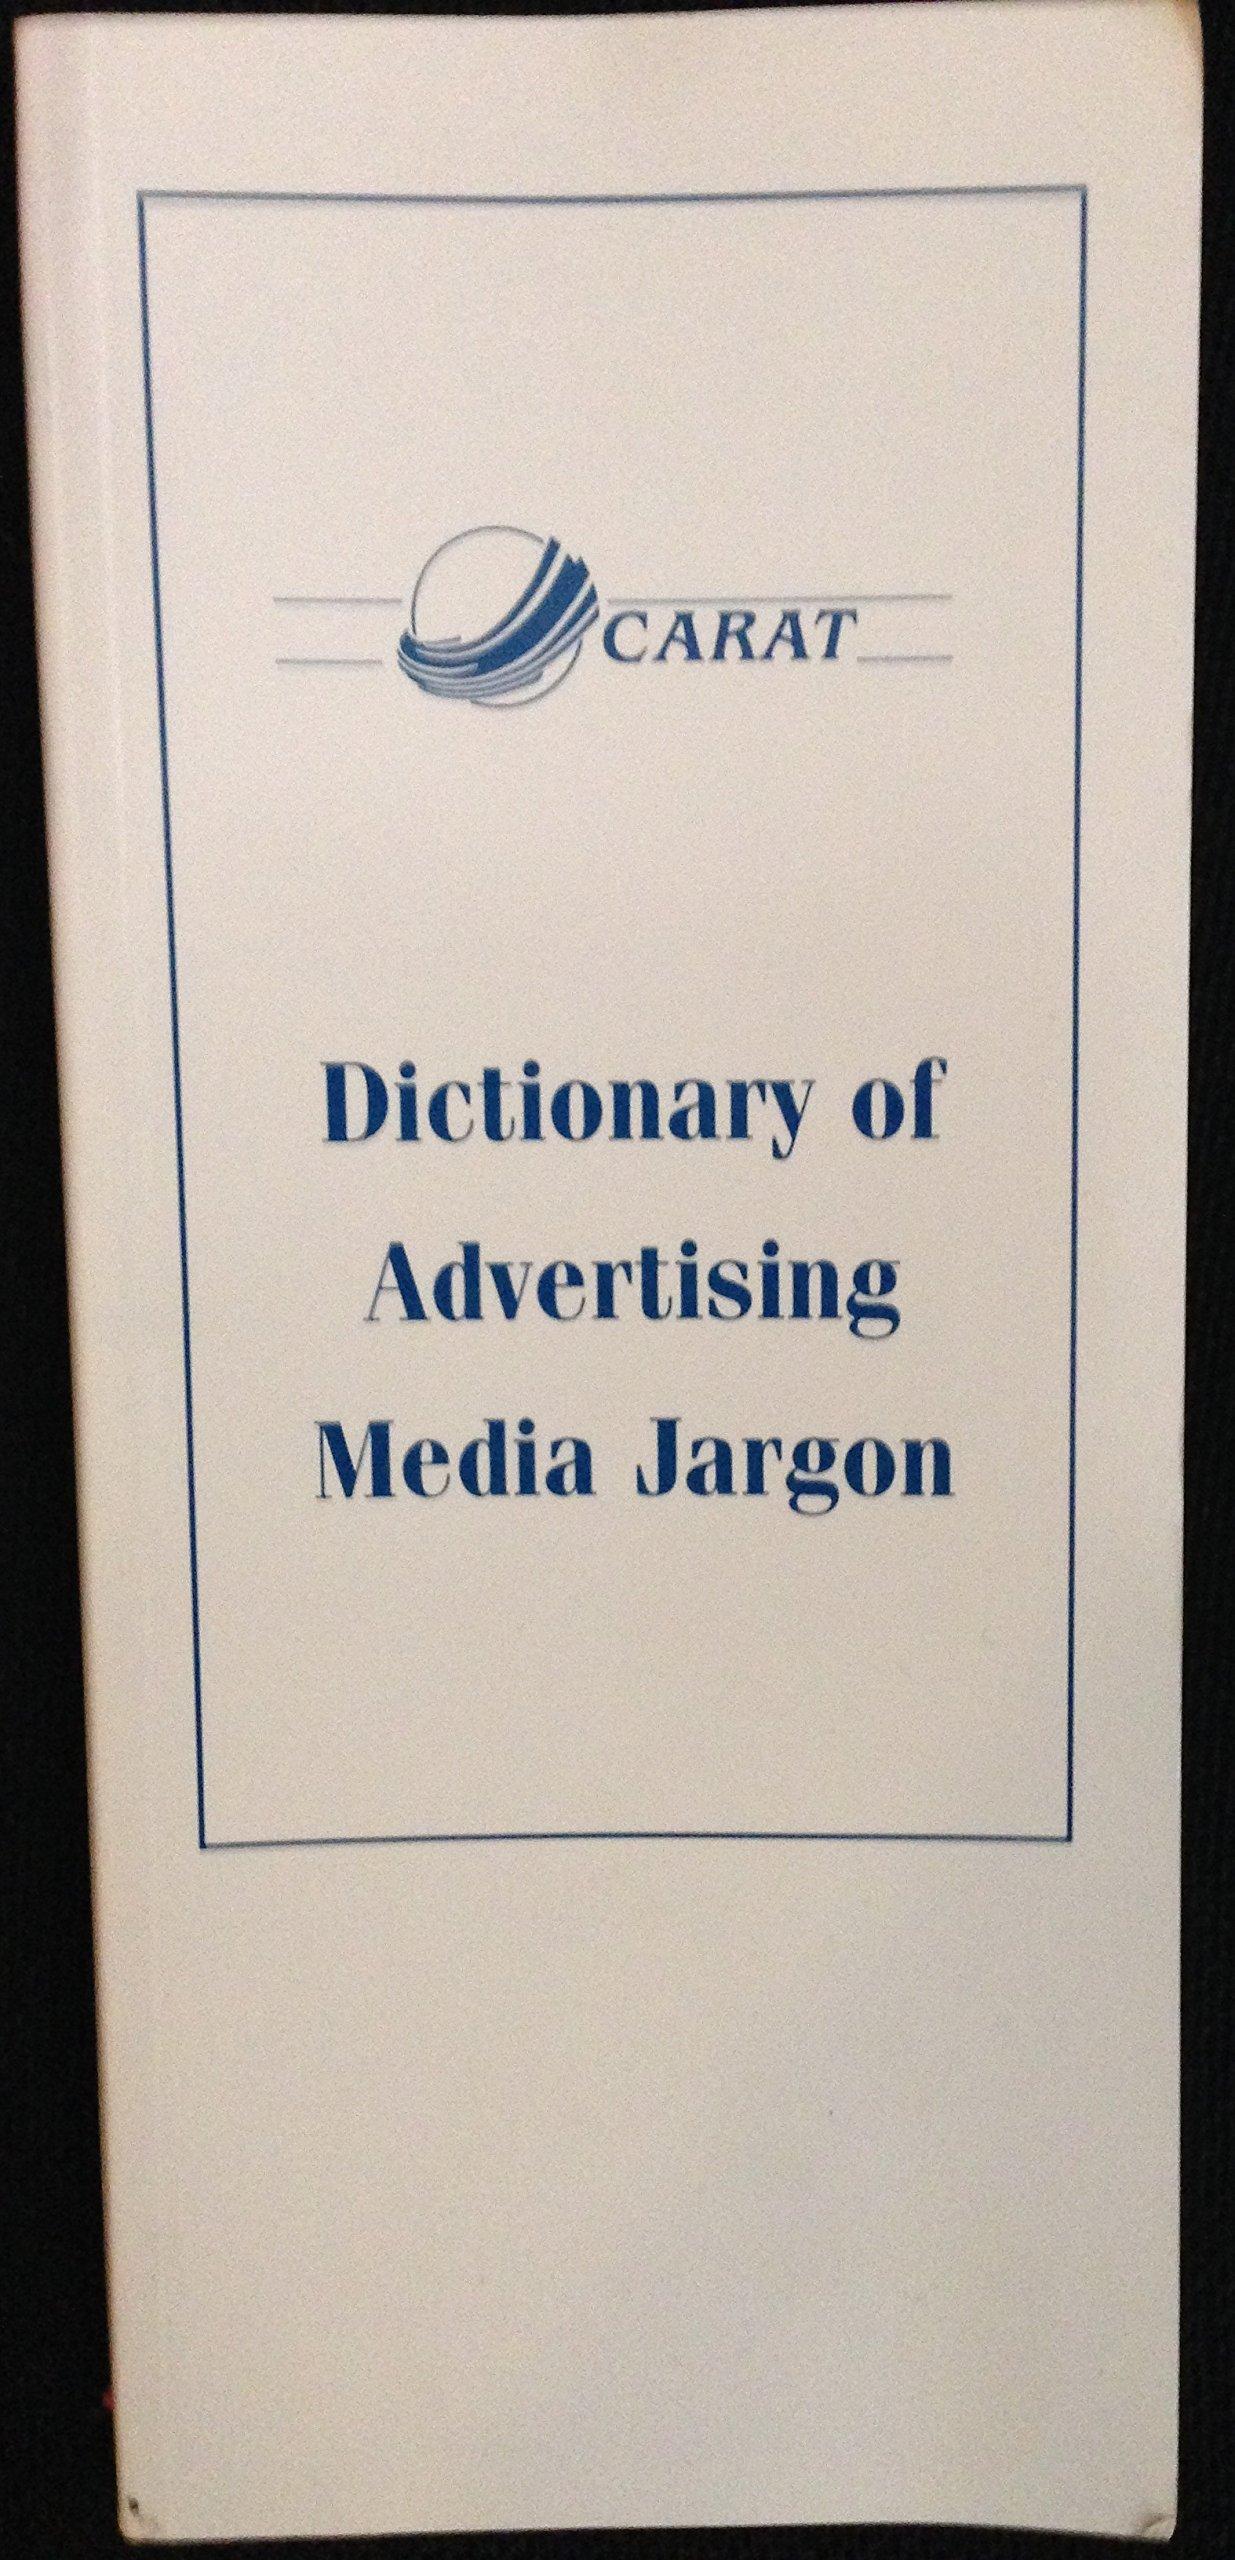 Carat Dictionary of Advertising Media Jargon: Crispin Davis